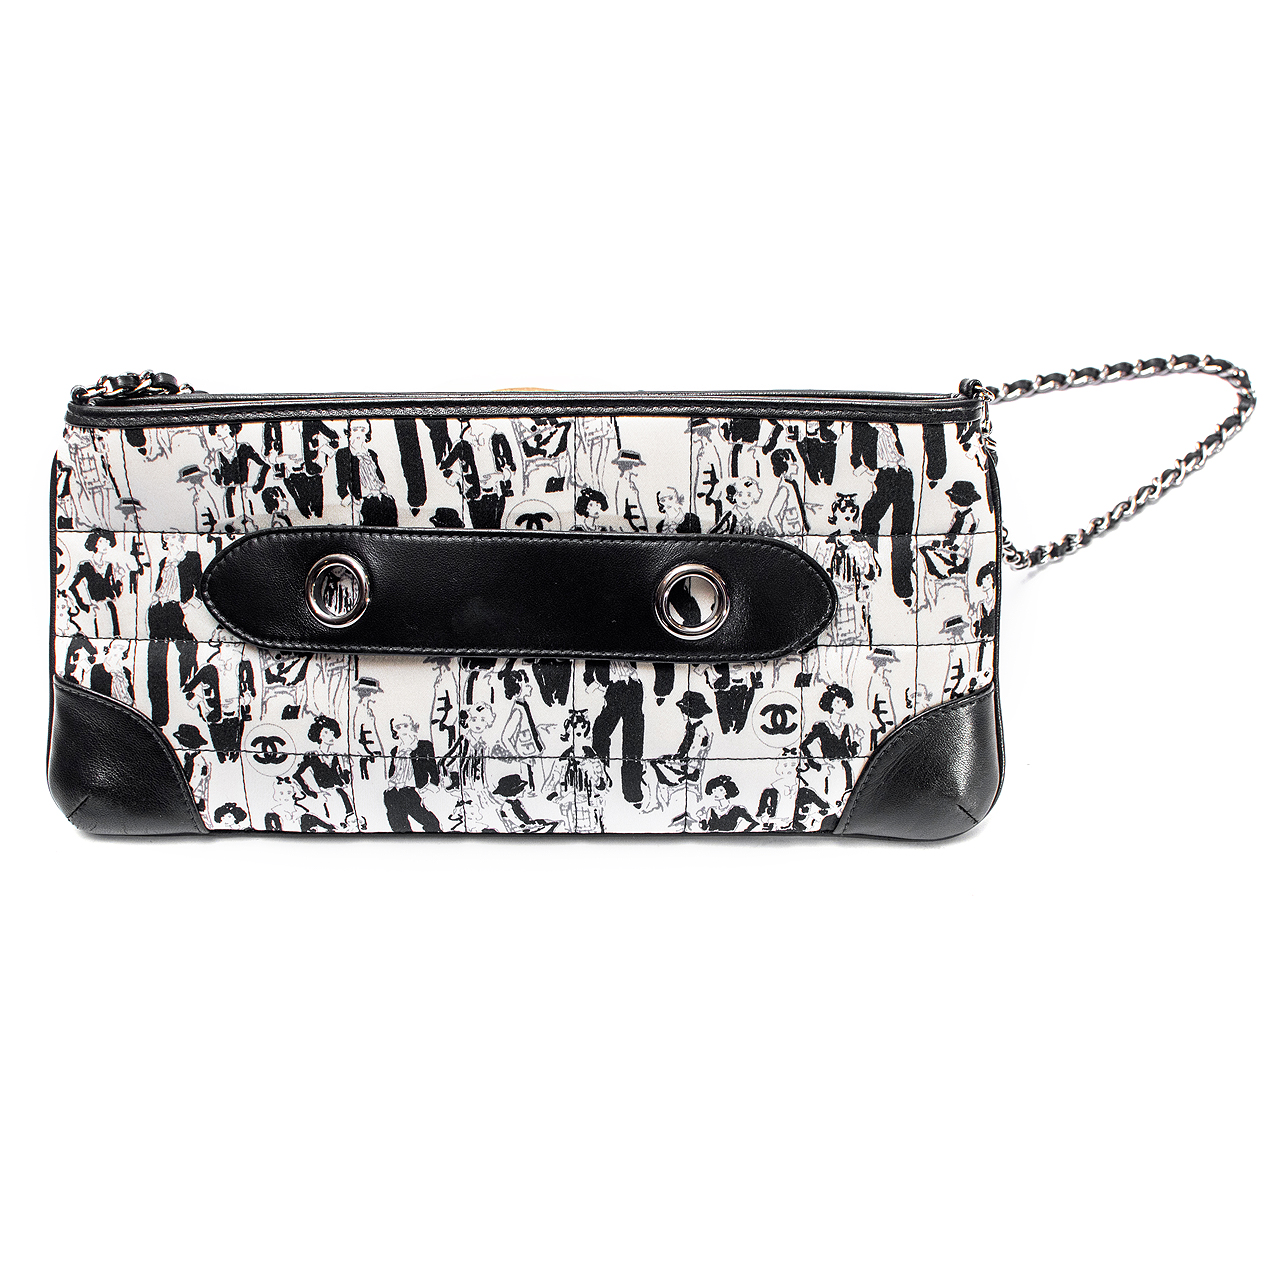 082b772e7 Bolsa Chanel Coco Mademoiselle | Box de Grife